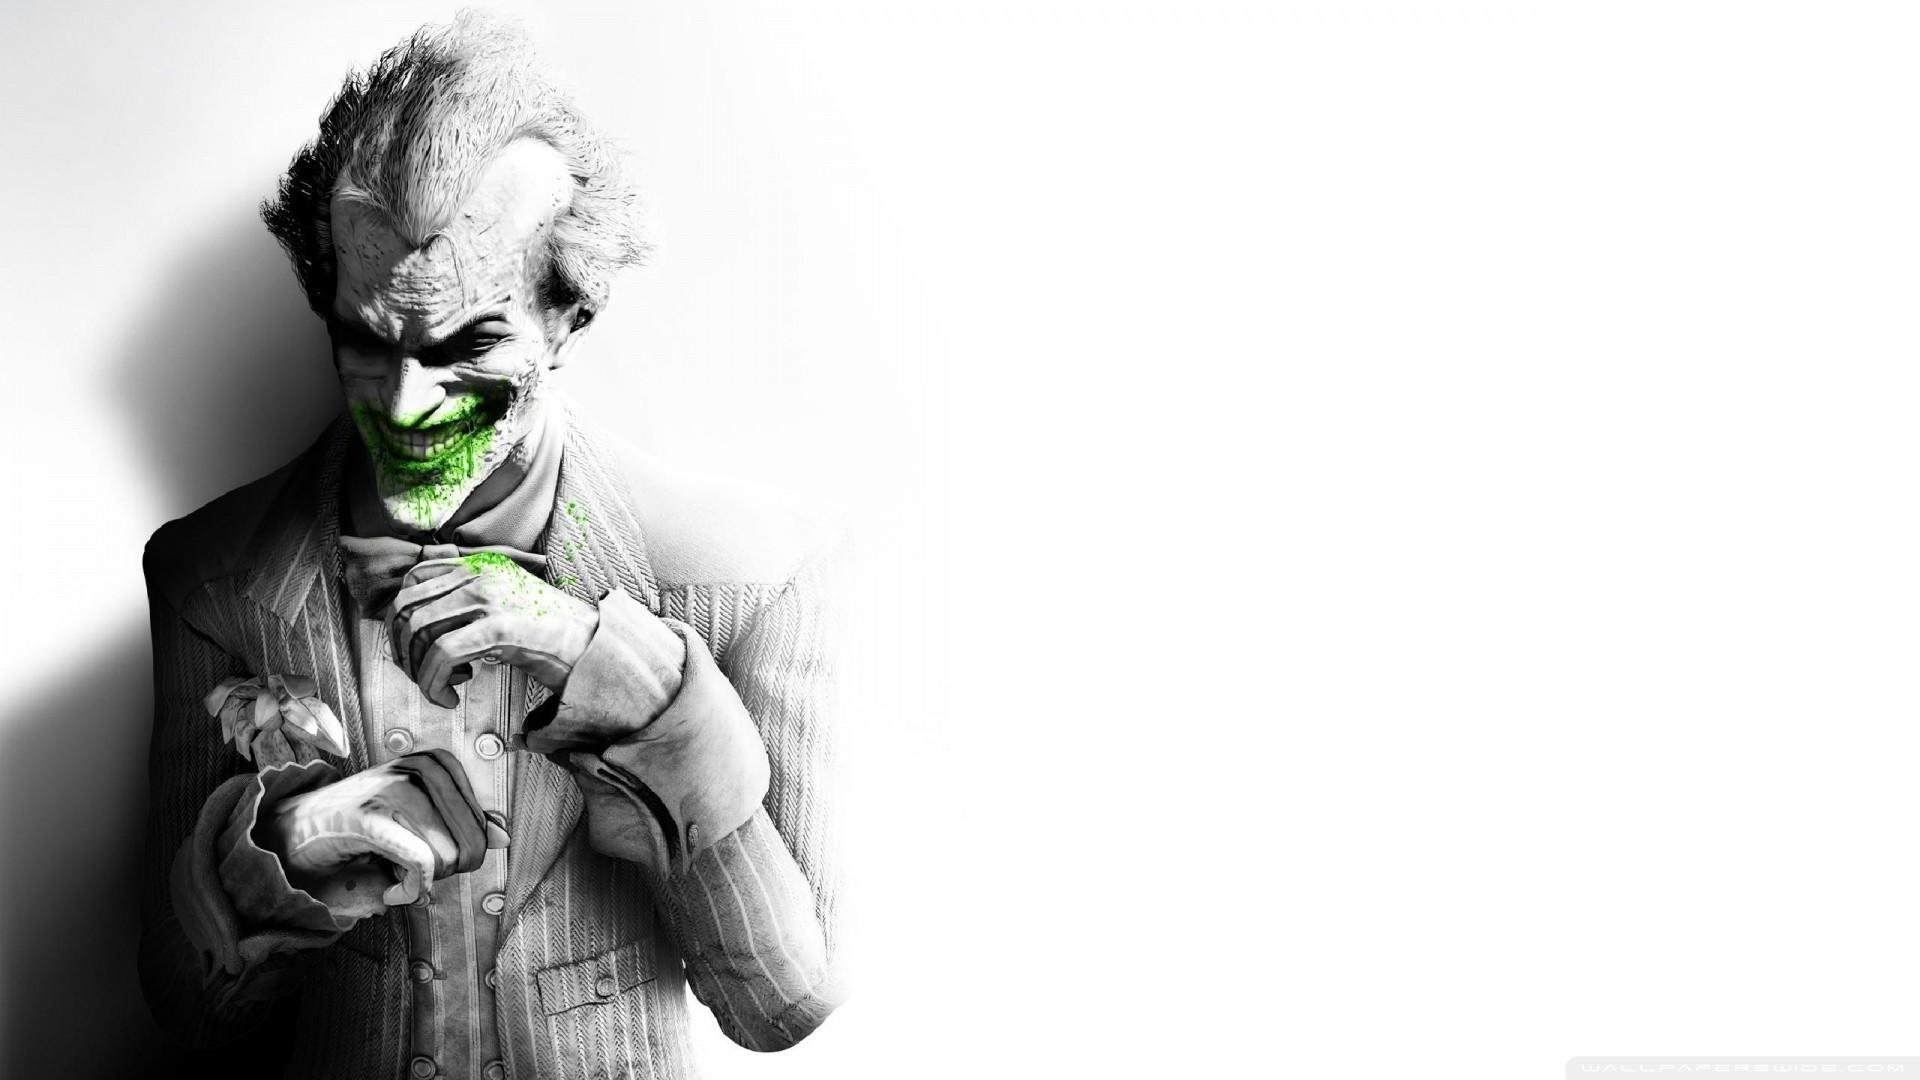 190 Batman: Arkham City HD Wallpapers | Backgrounds – Wallpaper Abyss